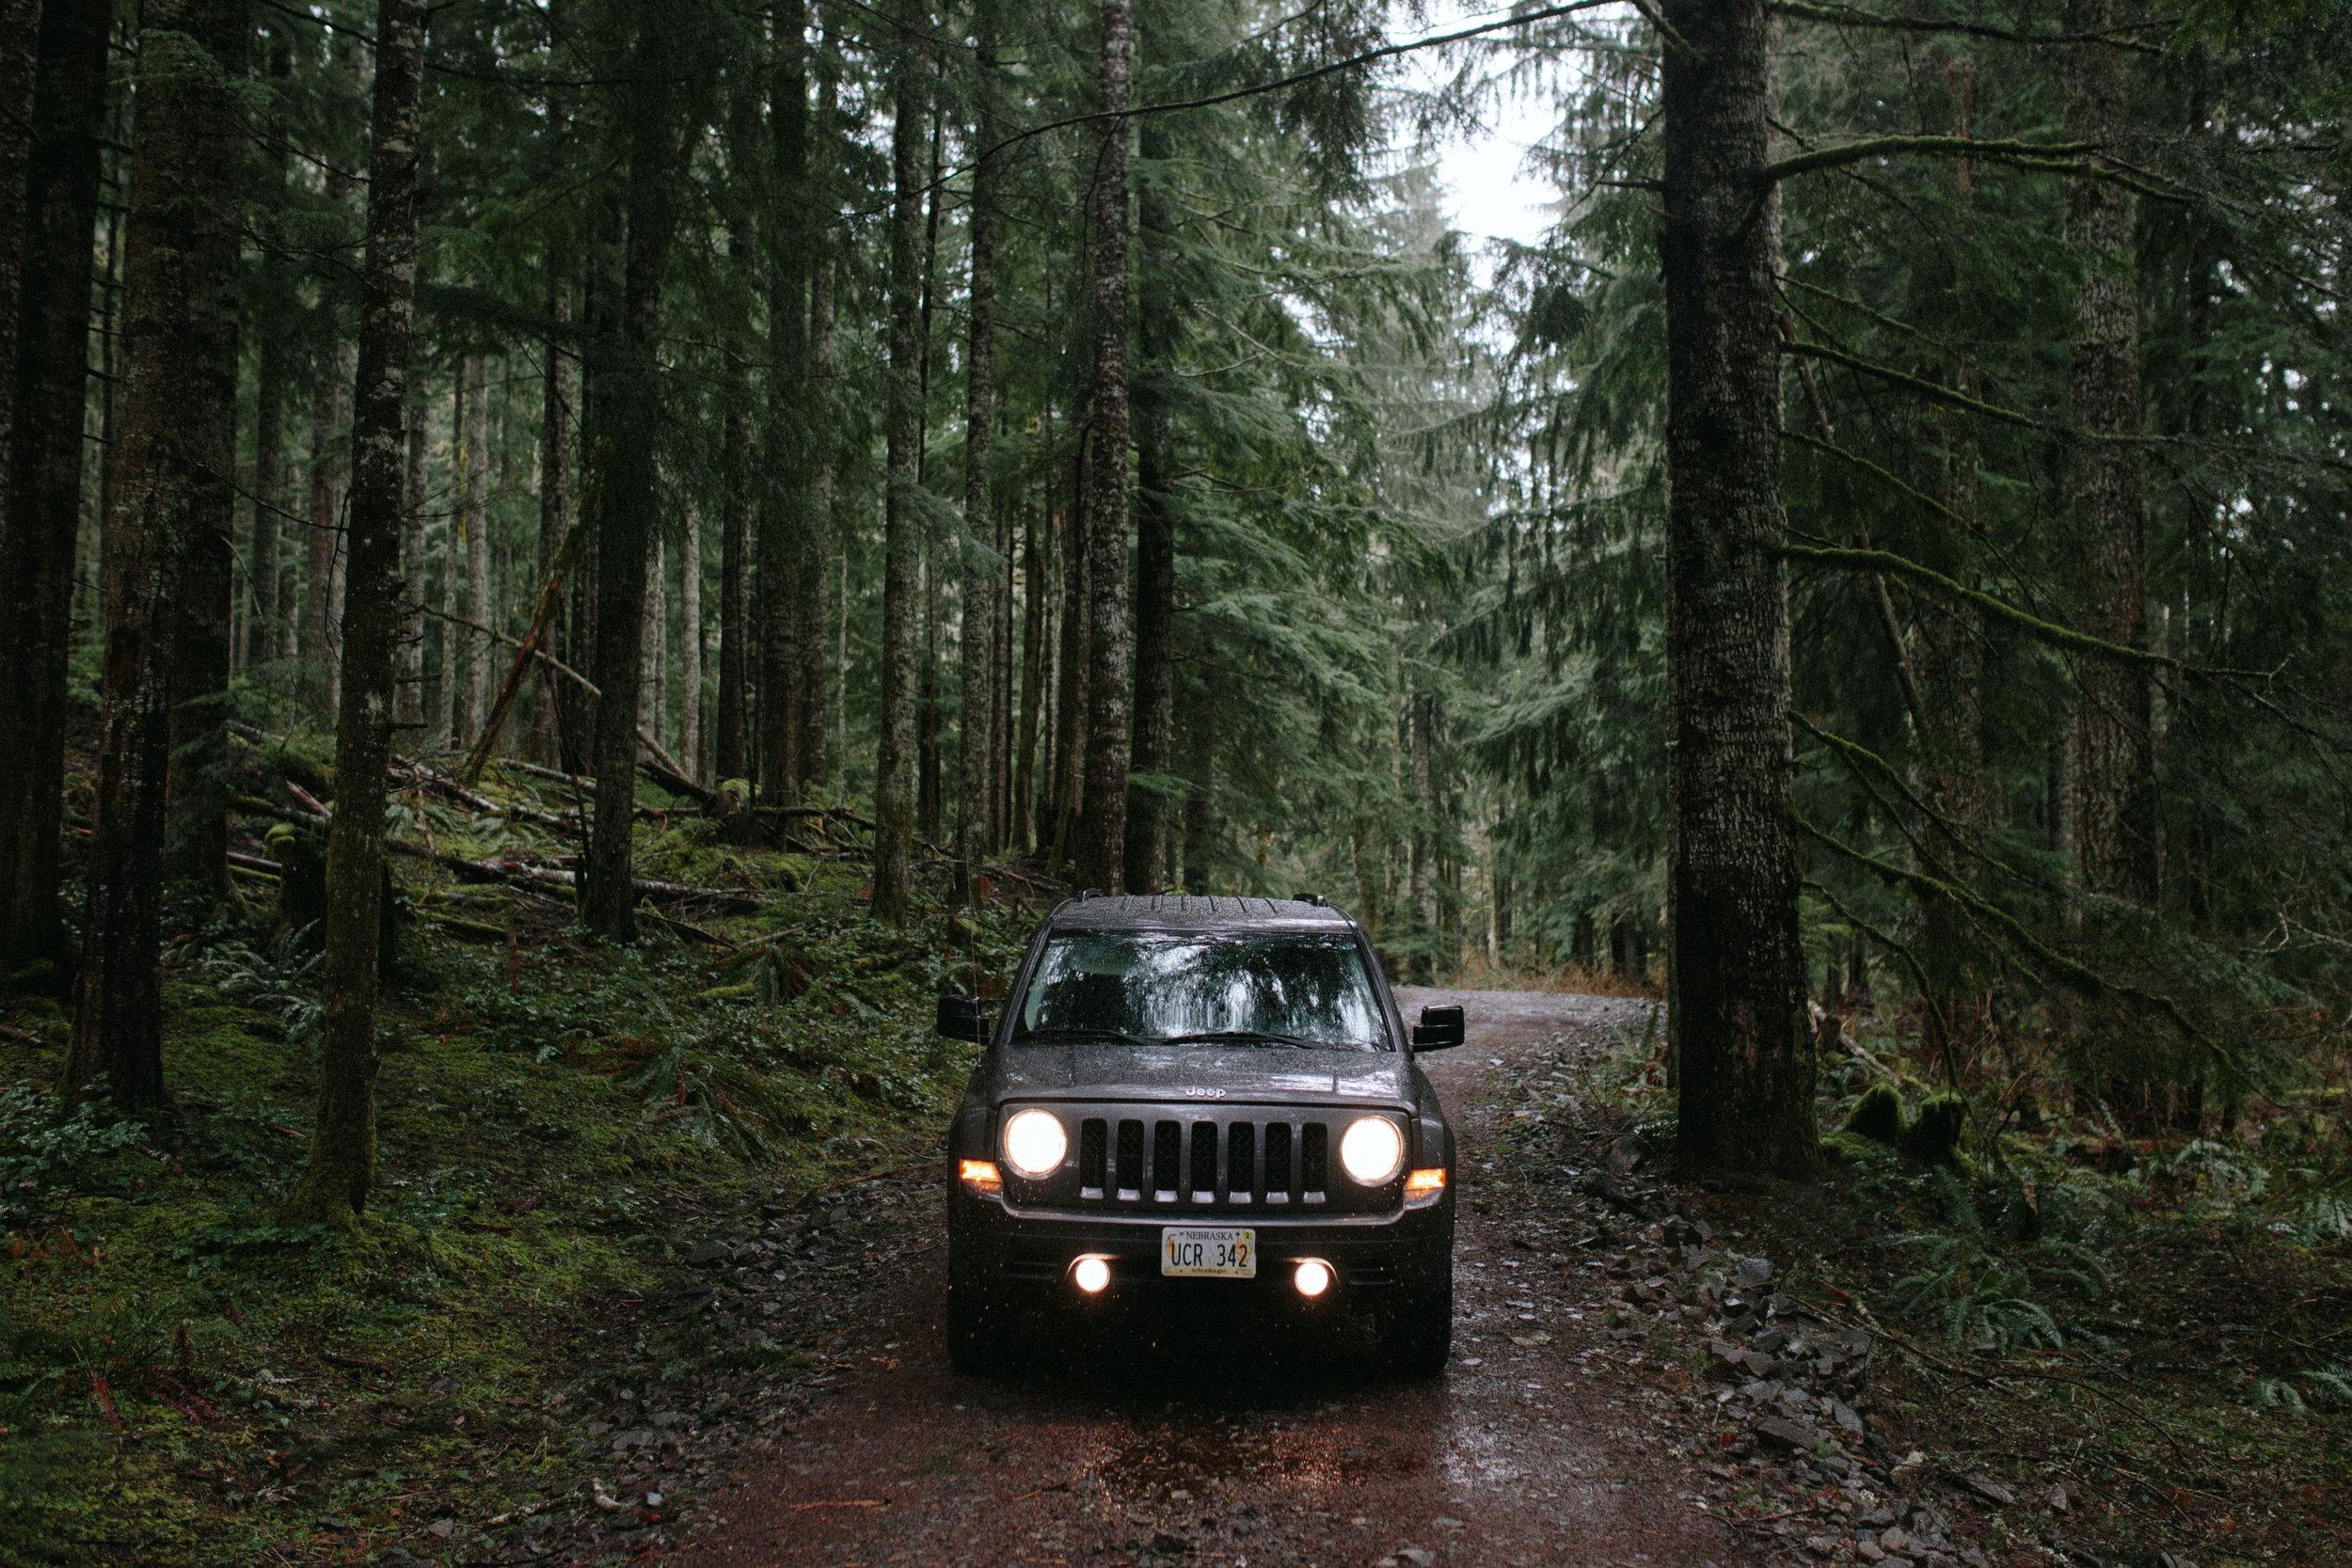 Oregon, 2017